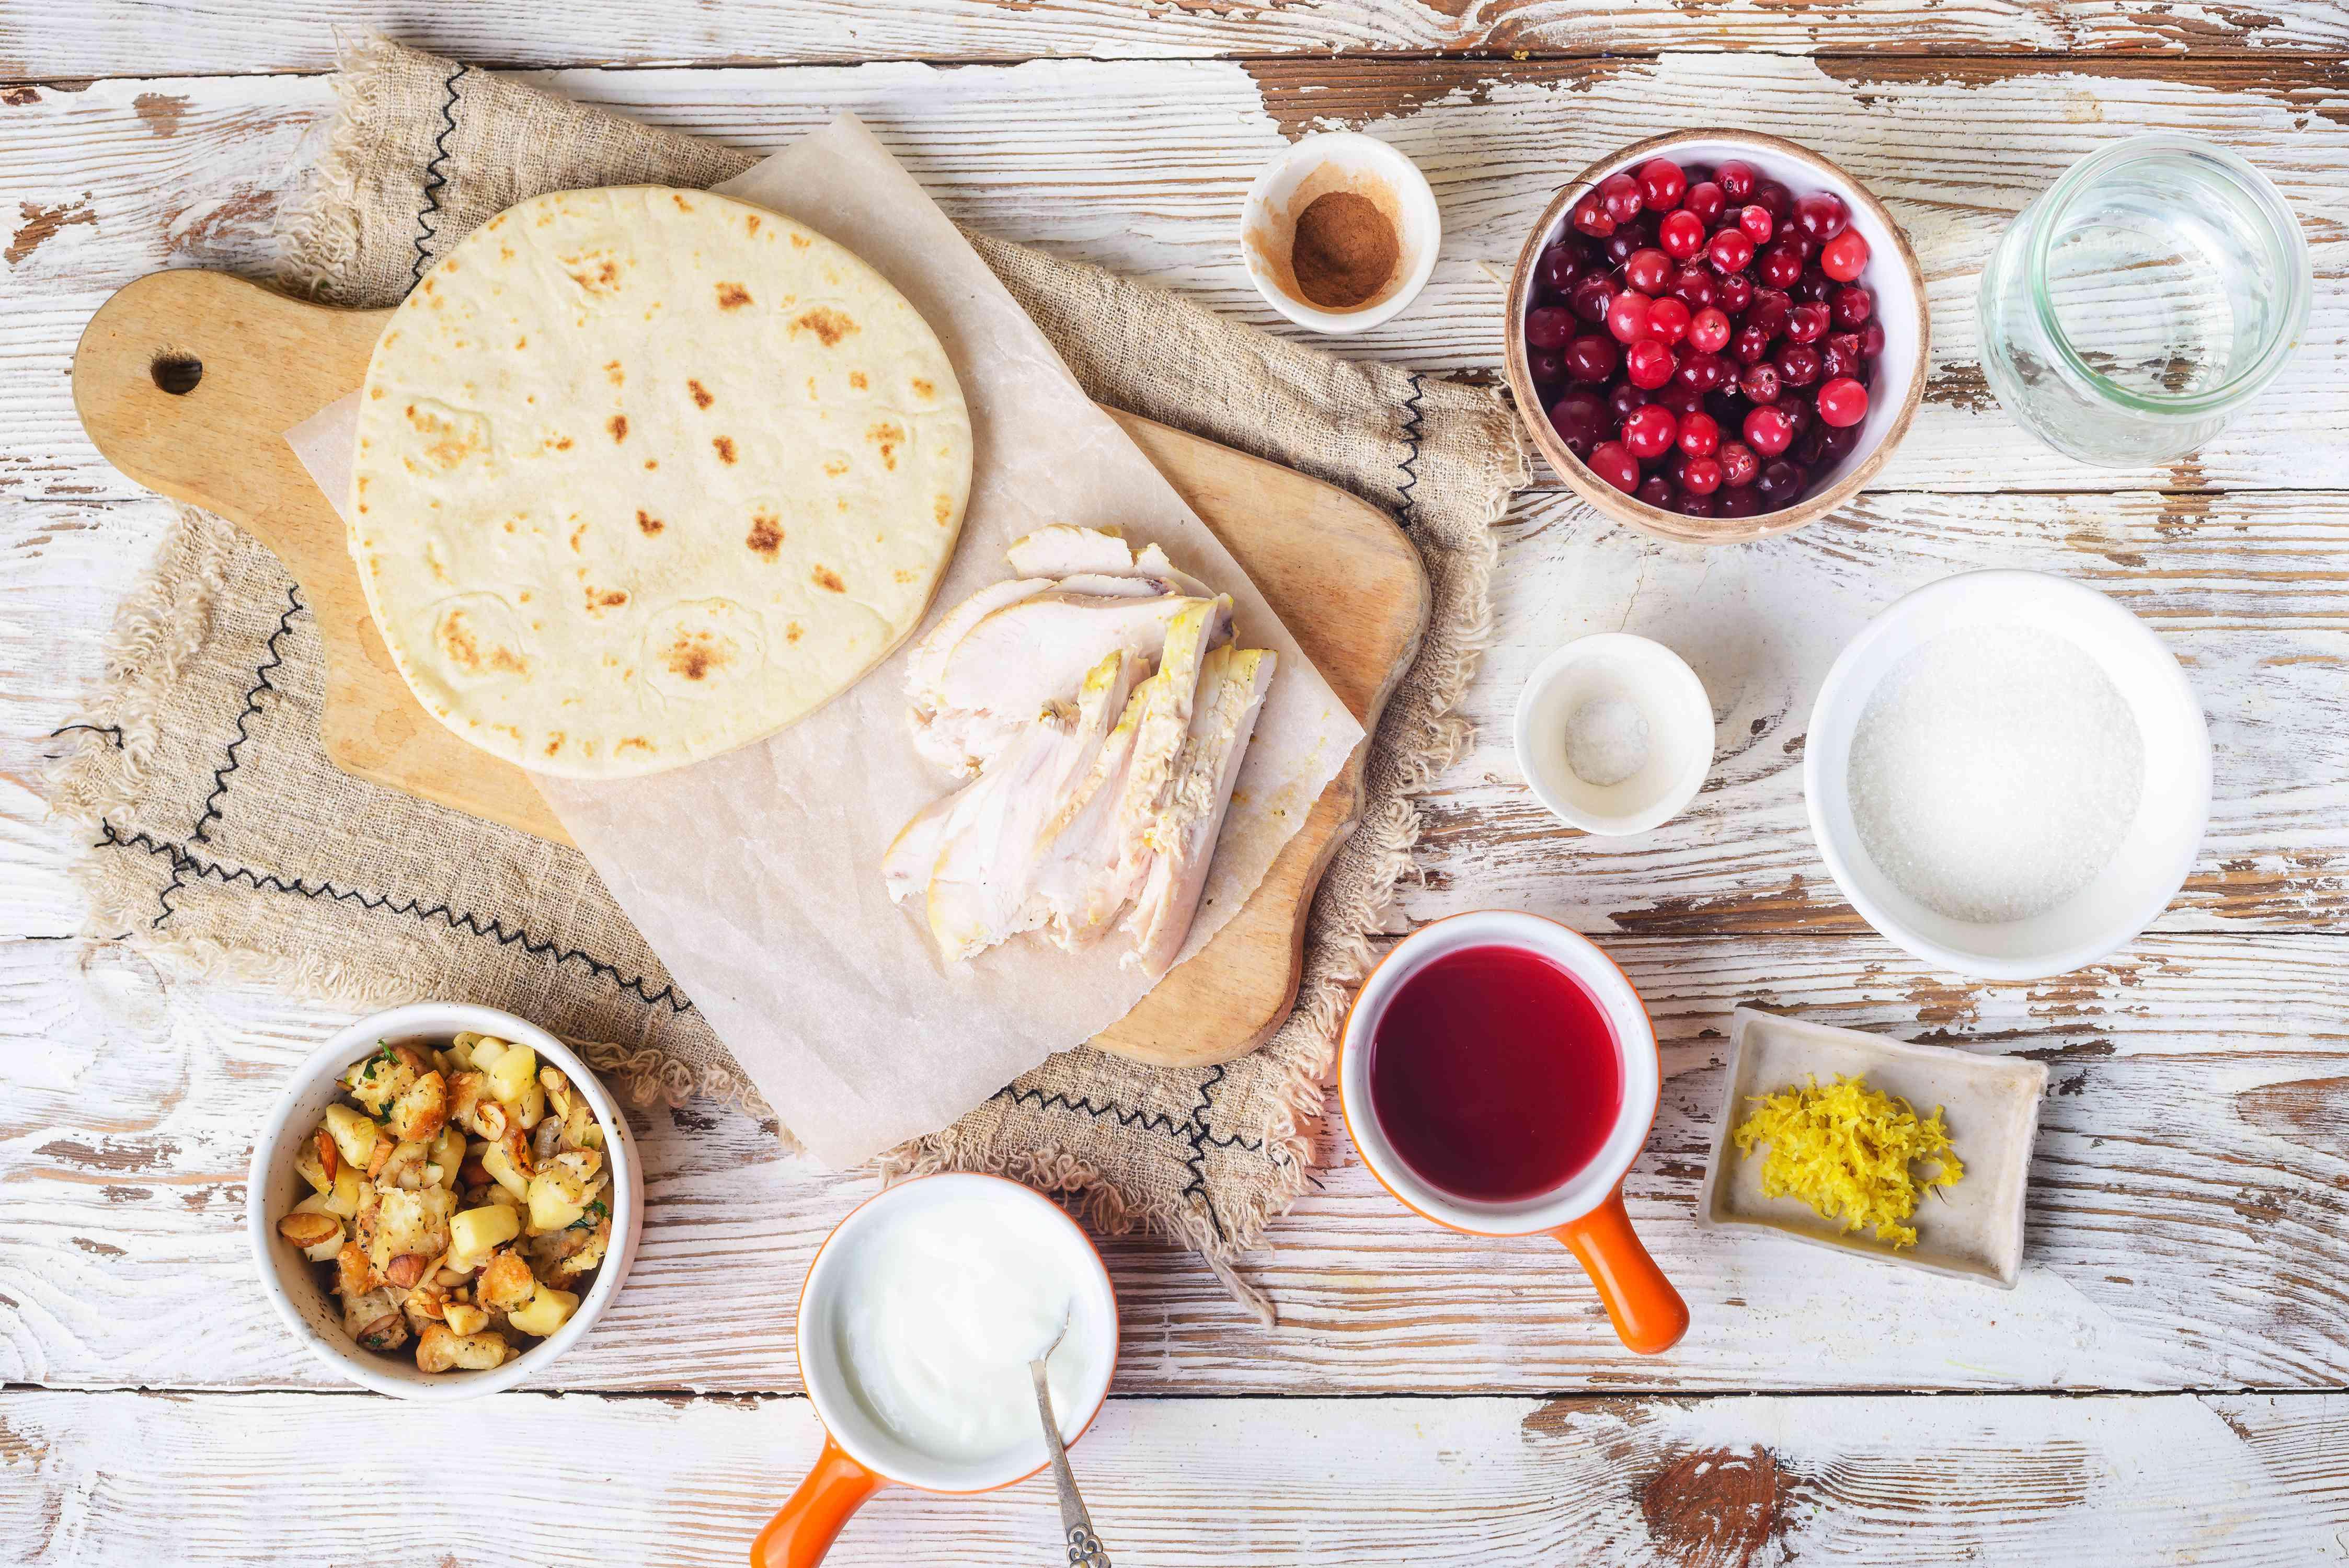 Ingredients for Thanksgiving leftovers pita